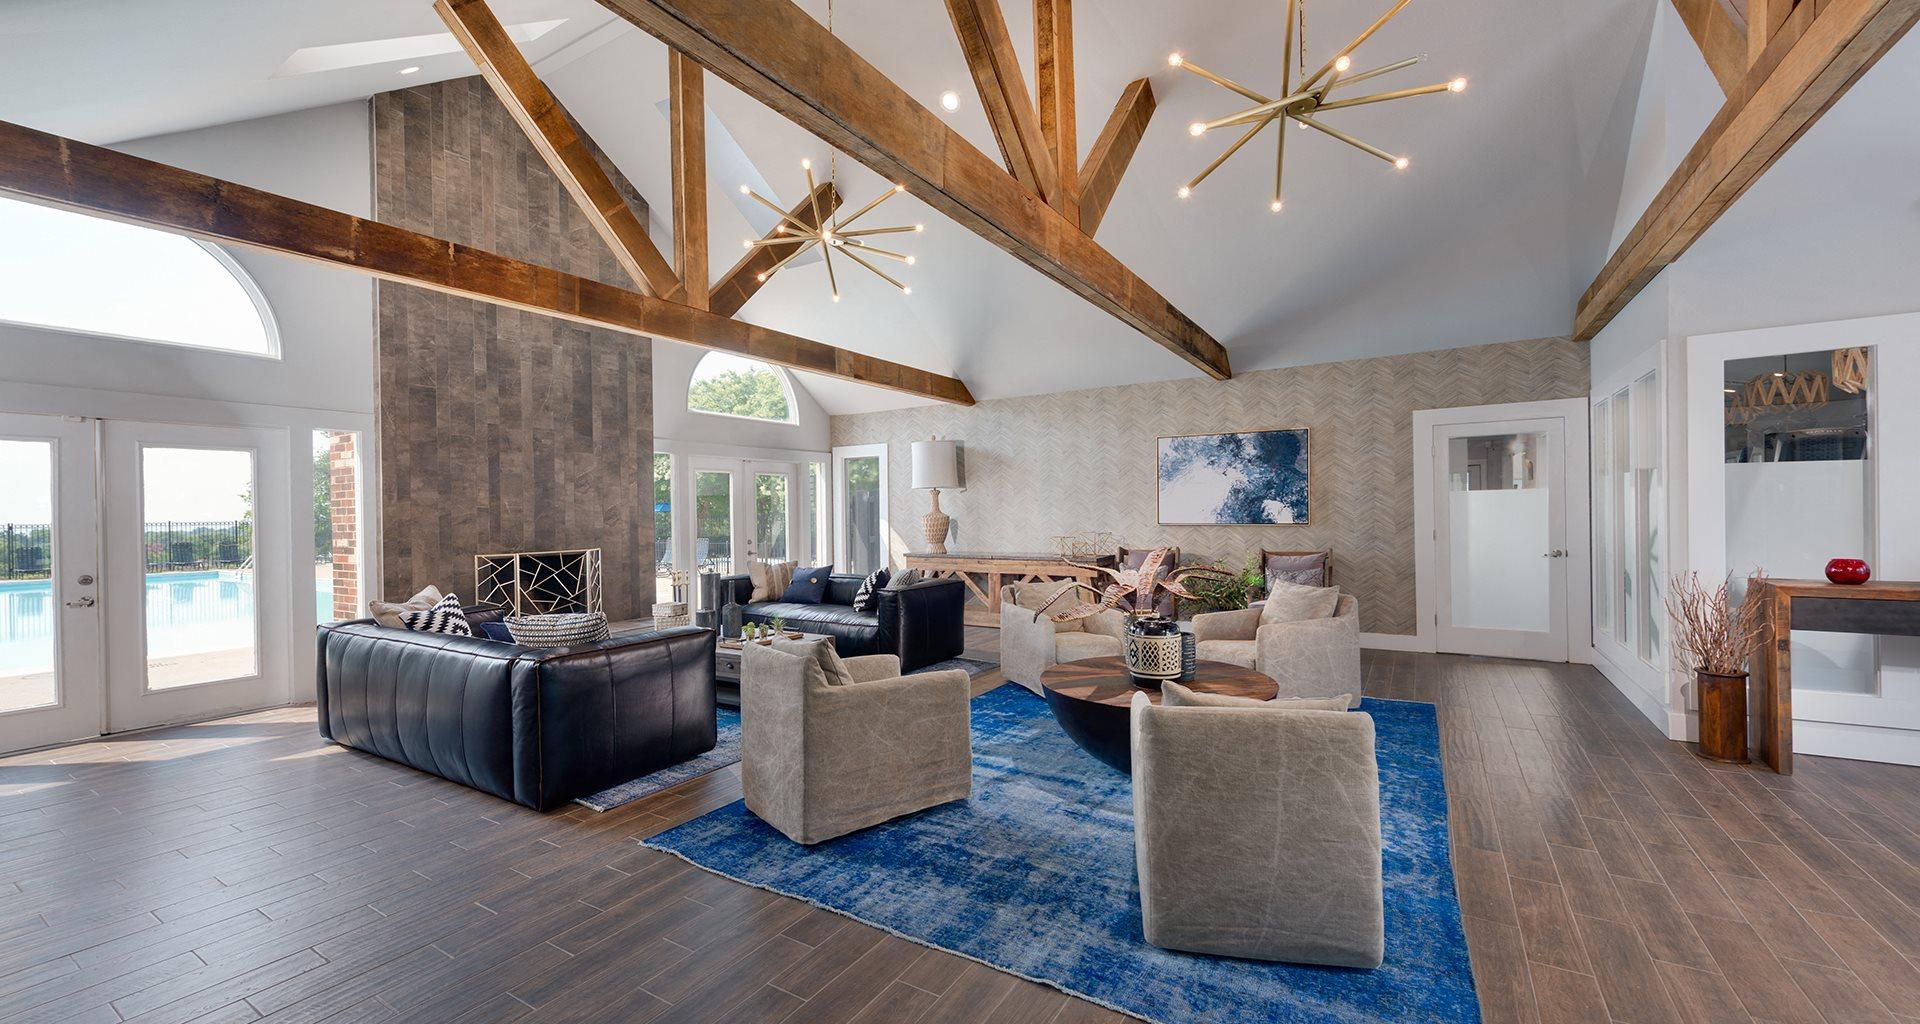 Potomac vista apartments apartments in woodbridge va for Interiors modern home furniture woodbridge va